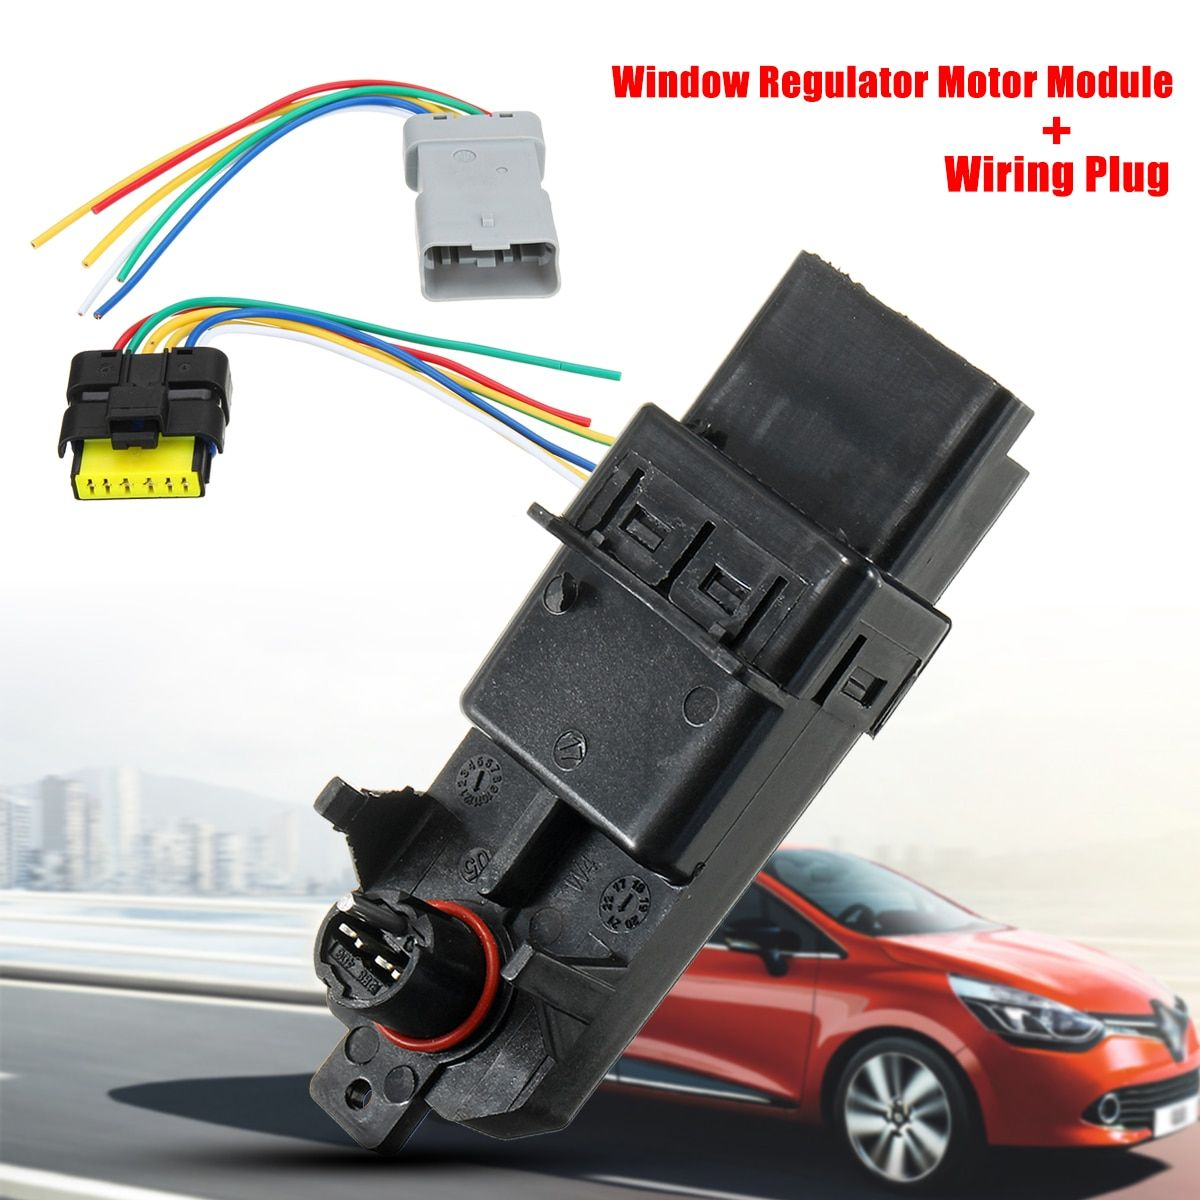 Auto Elektrische Fensterheber Regler Modul Regler Verdrahtung Stecker Harness für Renault Clio/Espace/Grand Scenic/Megane /Scenic